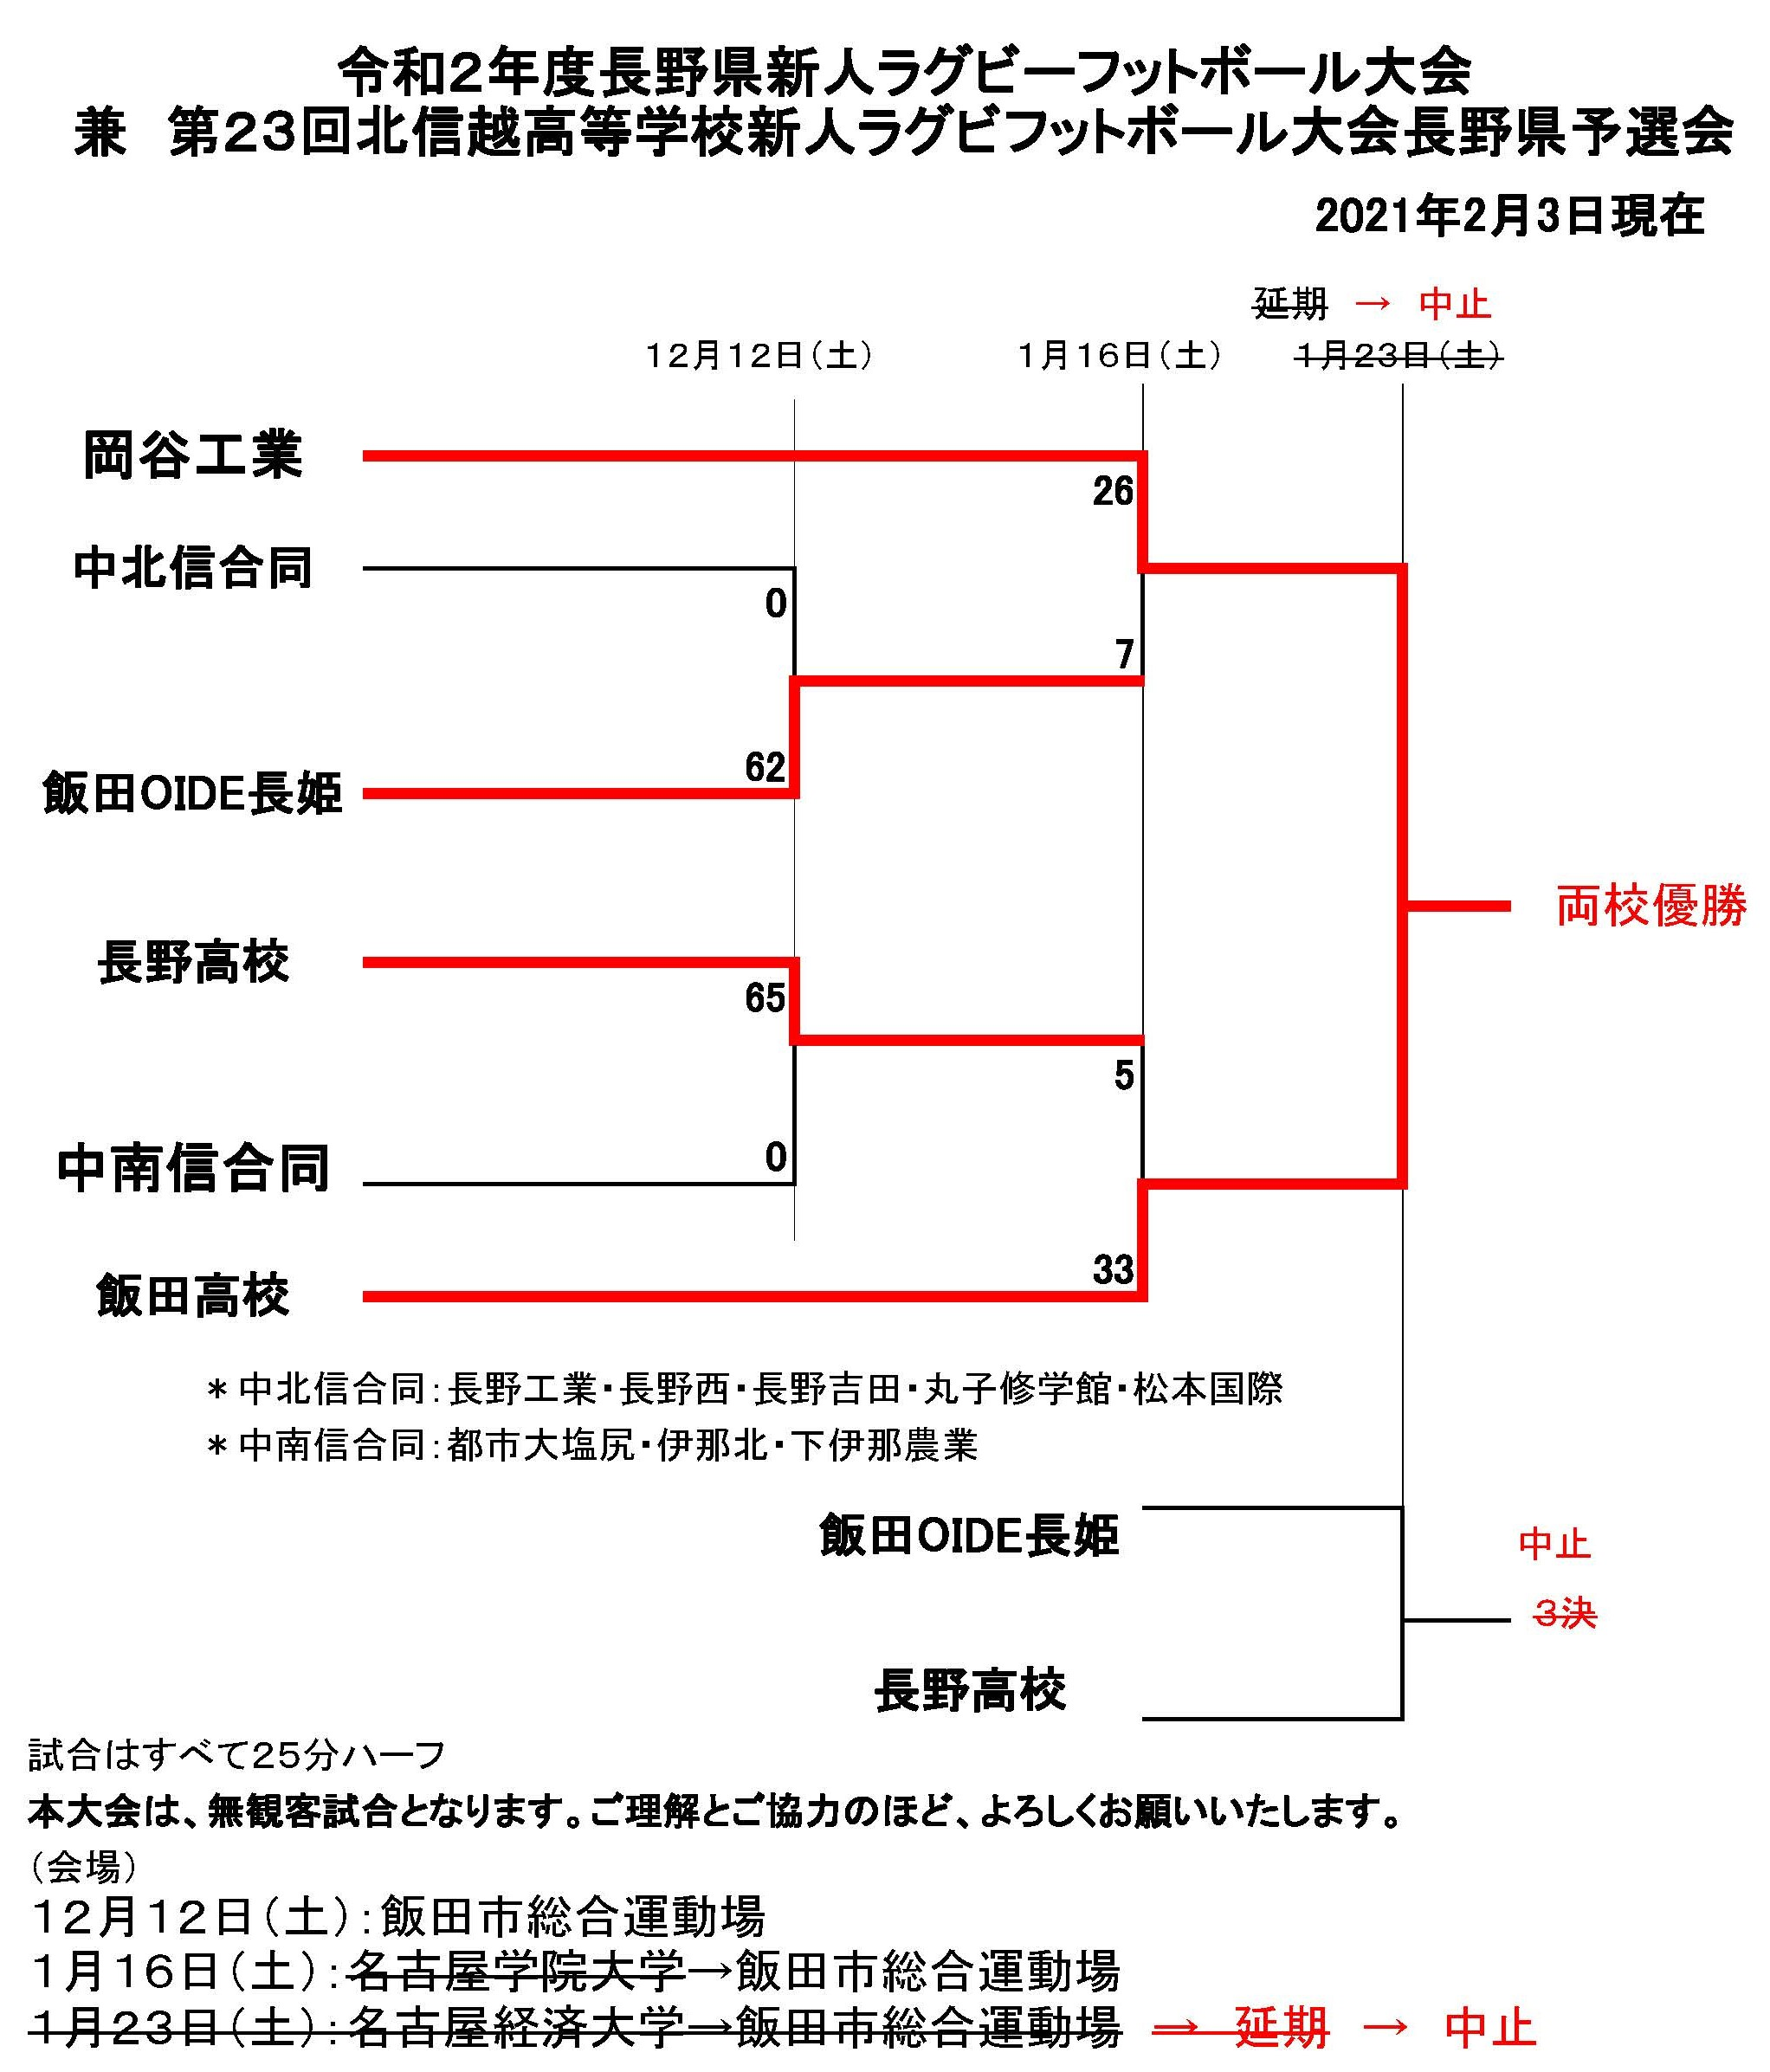 2020-shinjin-20210203.jpg